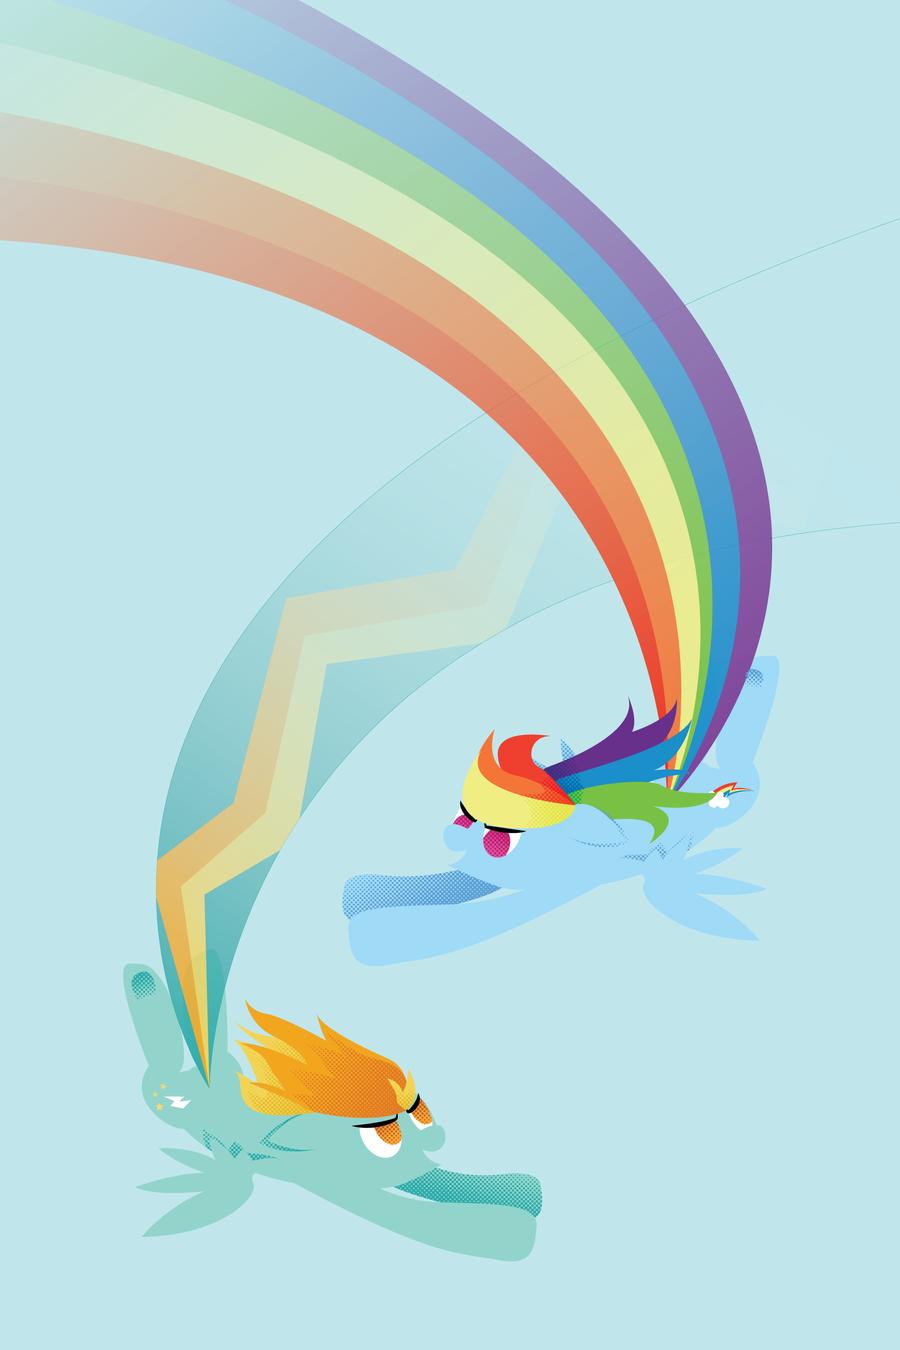 rainbow dash vs lighting - photo #3